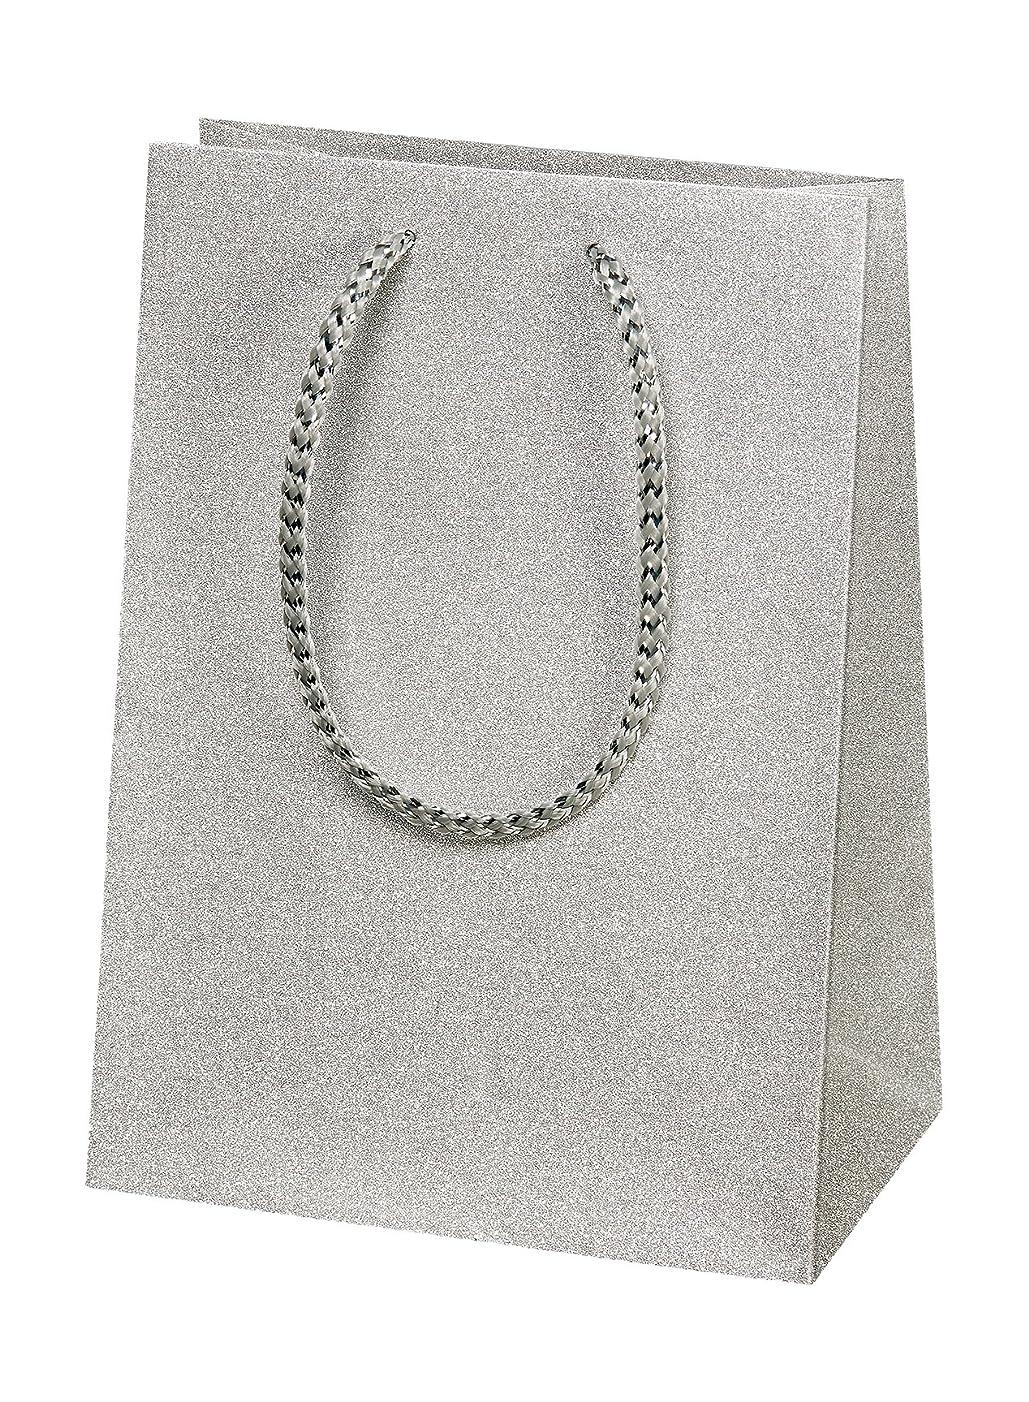 Susy Card 11428349?Gift Bag 16?x 22?x 10?cm Glitter Silver